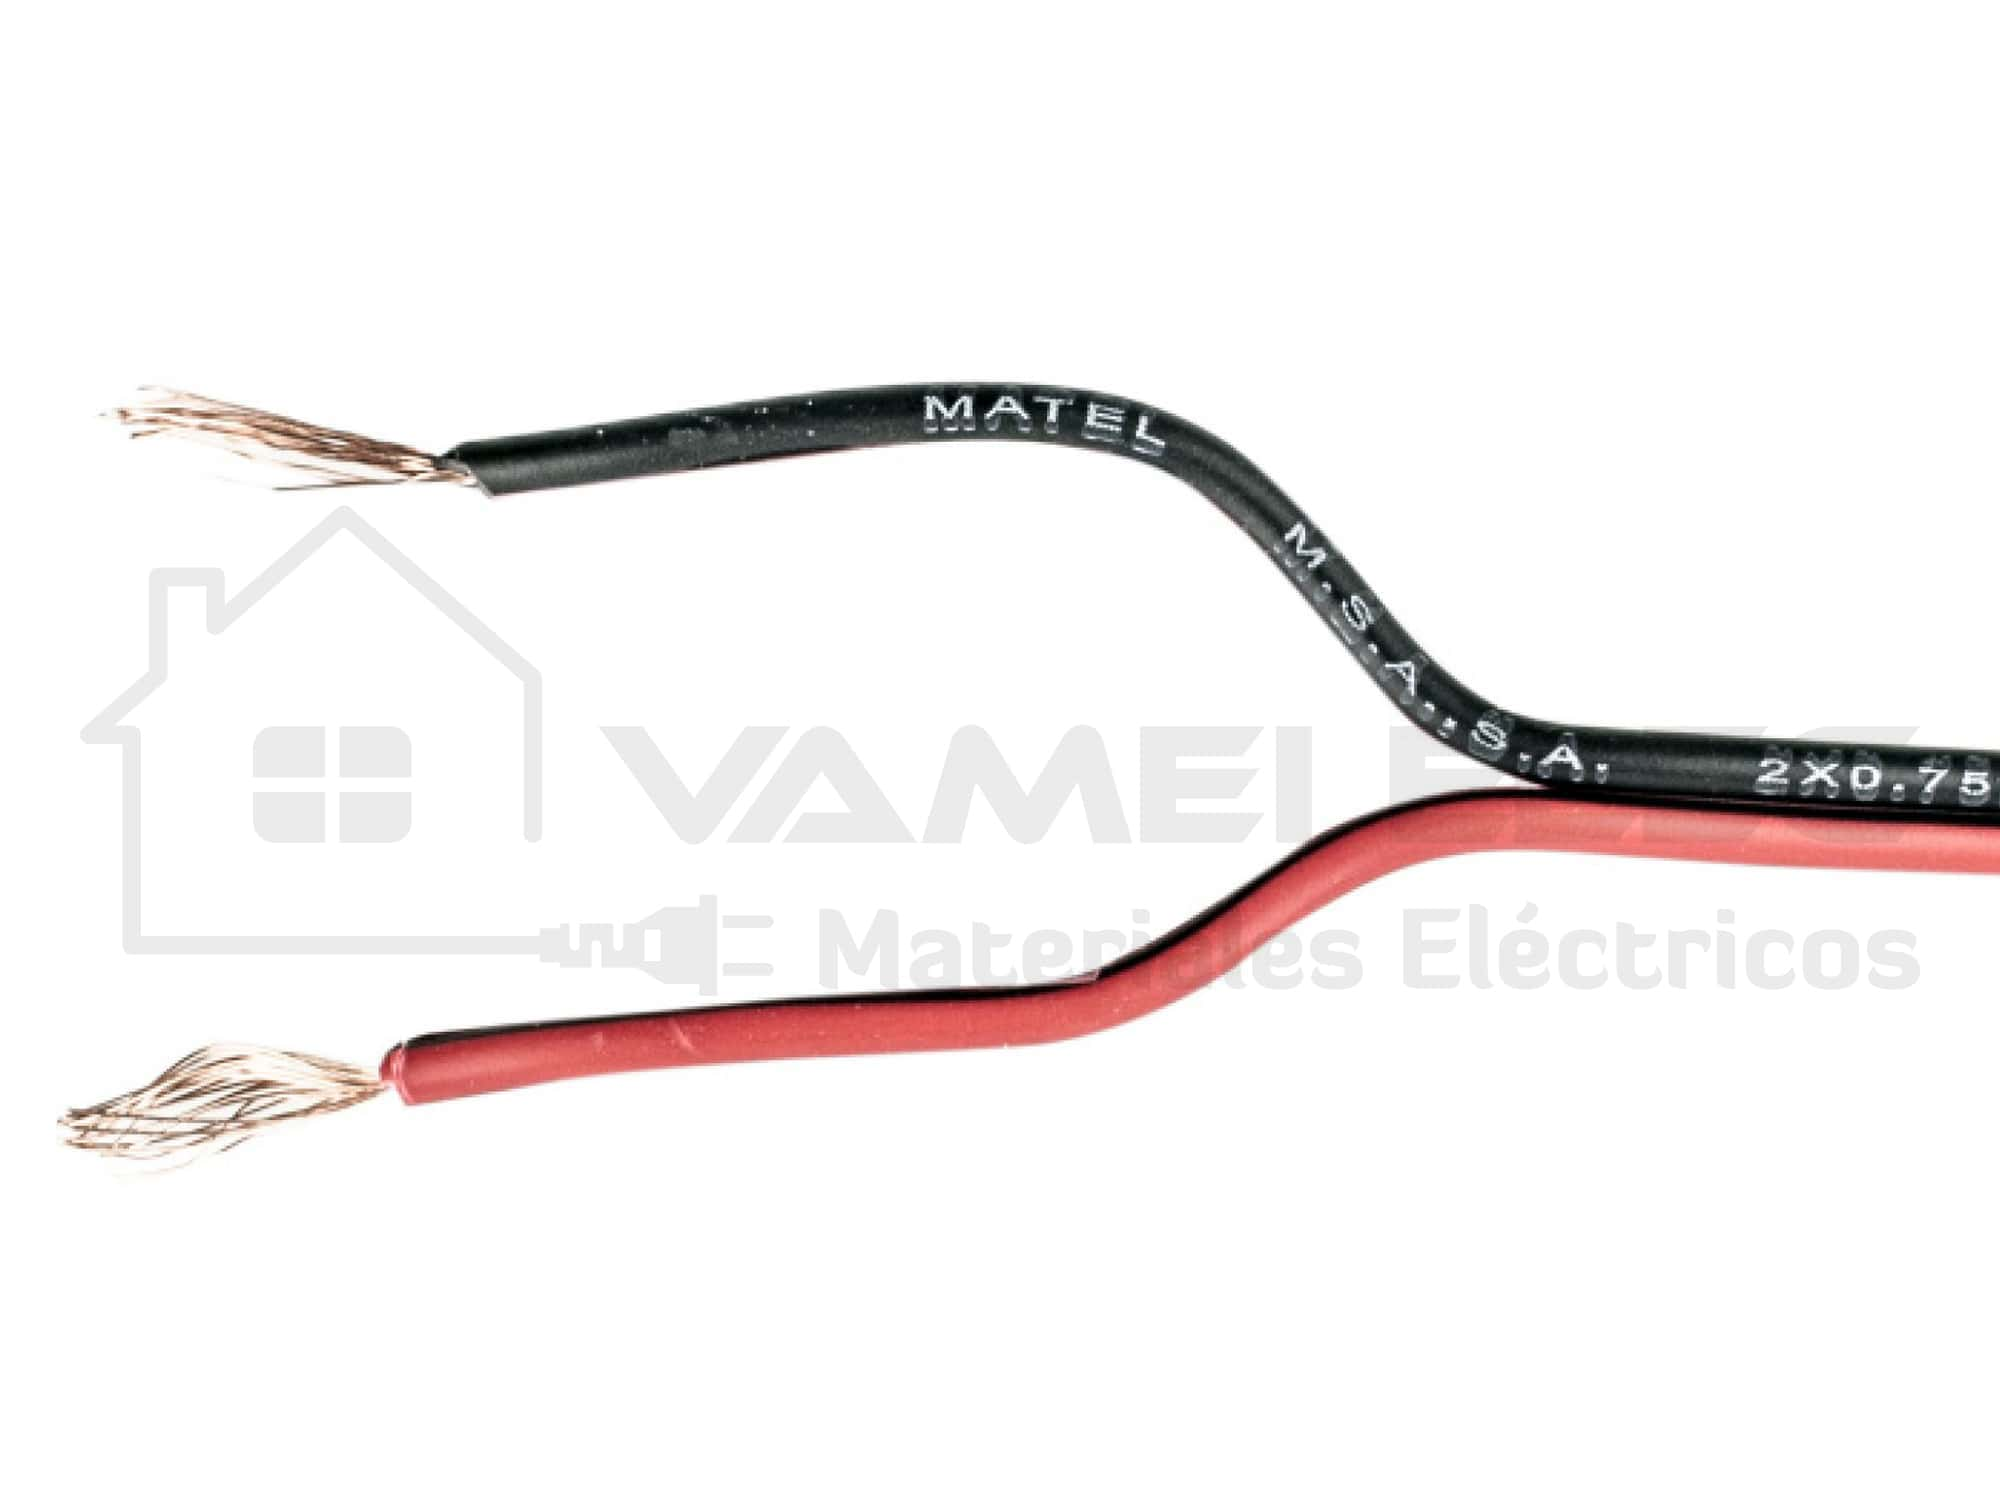 VAMEI Elec - Cables - Paralelo